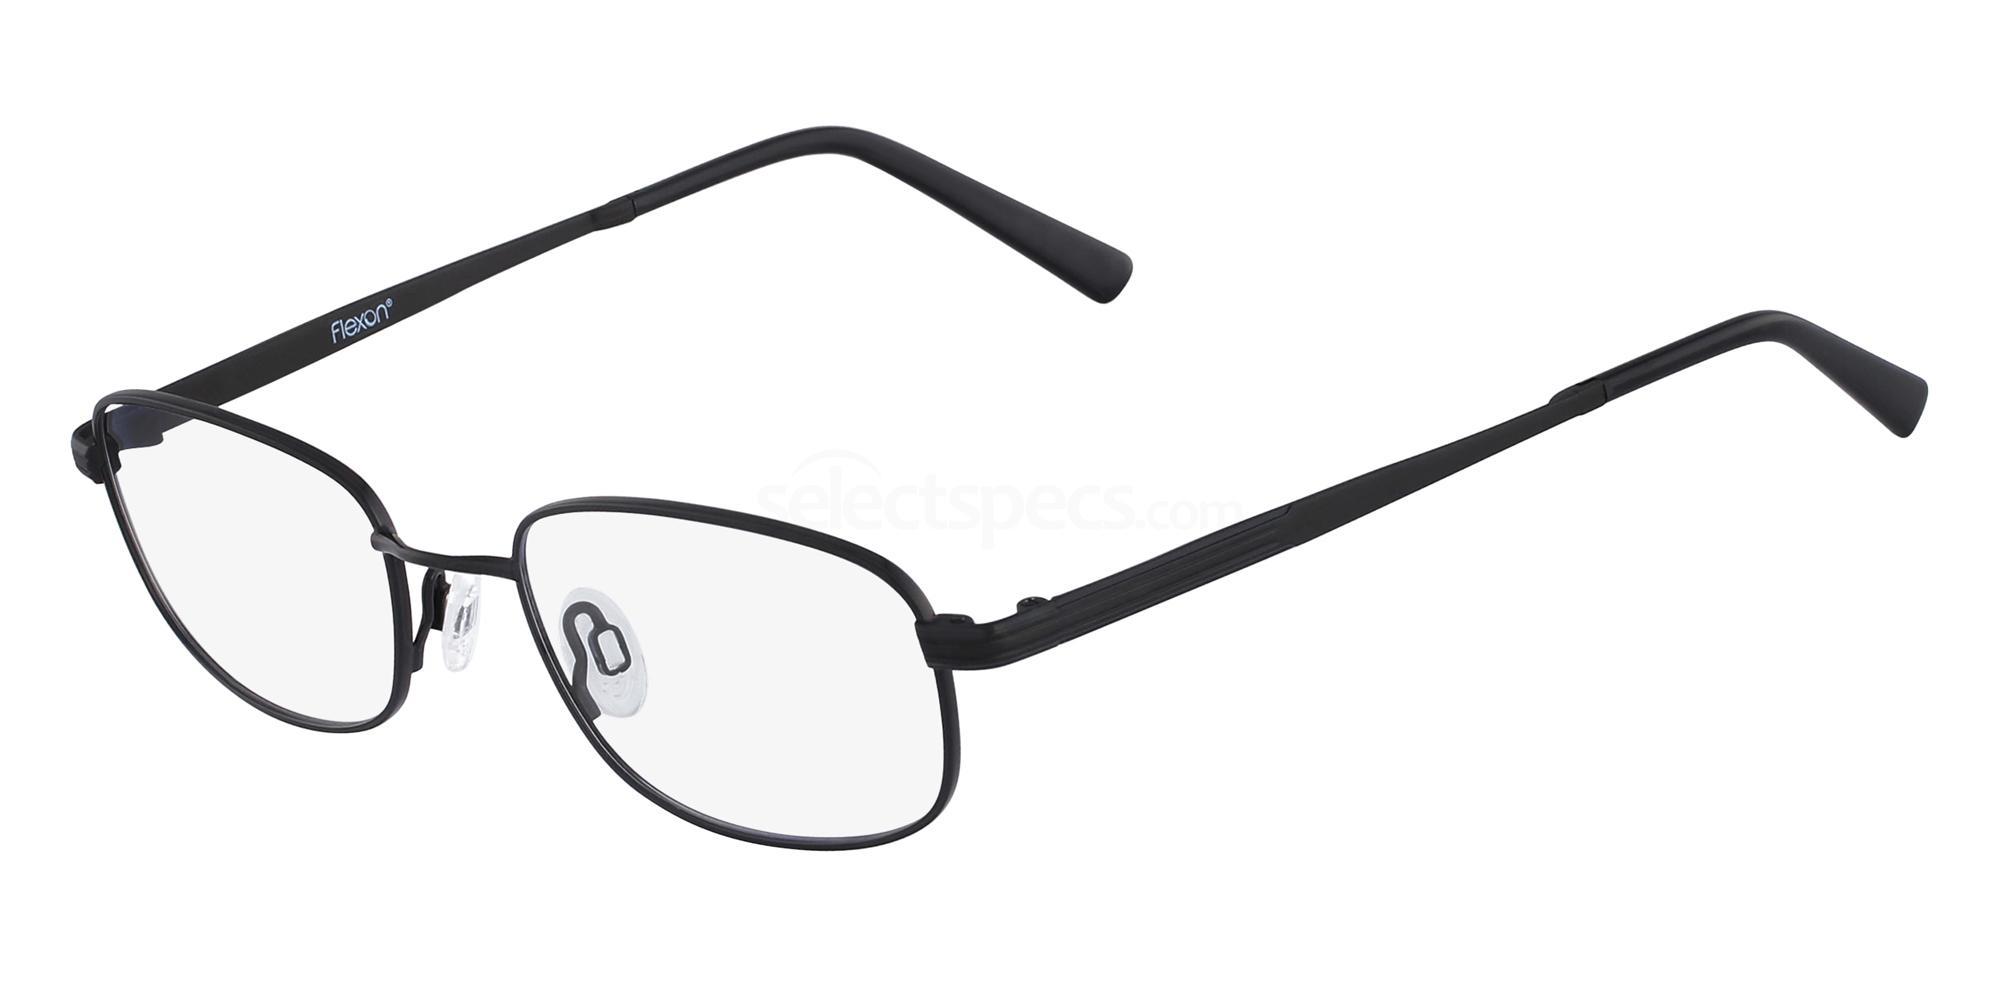 001 FLEXON CLARK 600 Glasses, Flexon